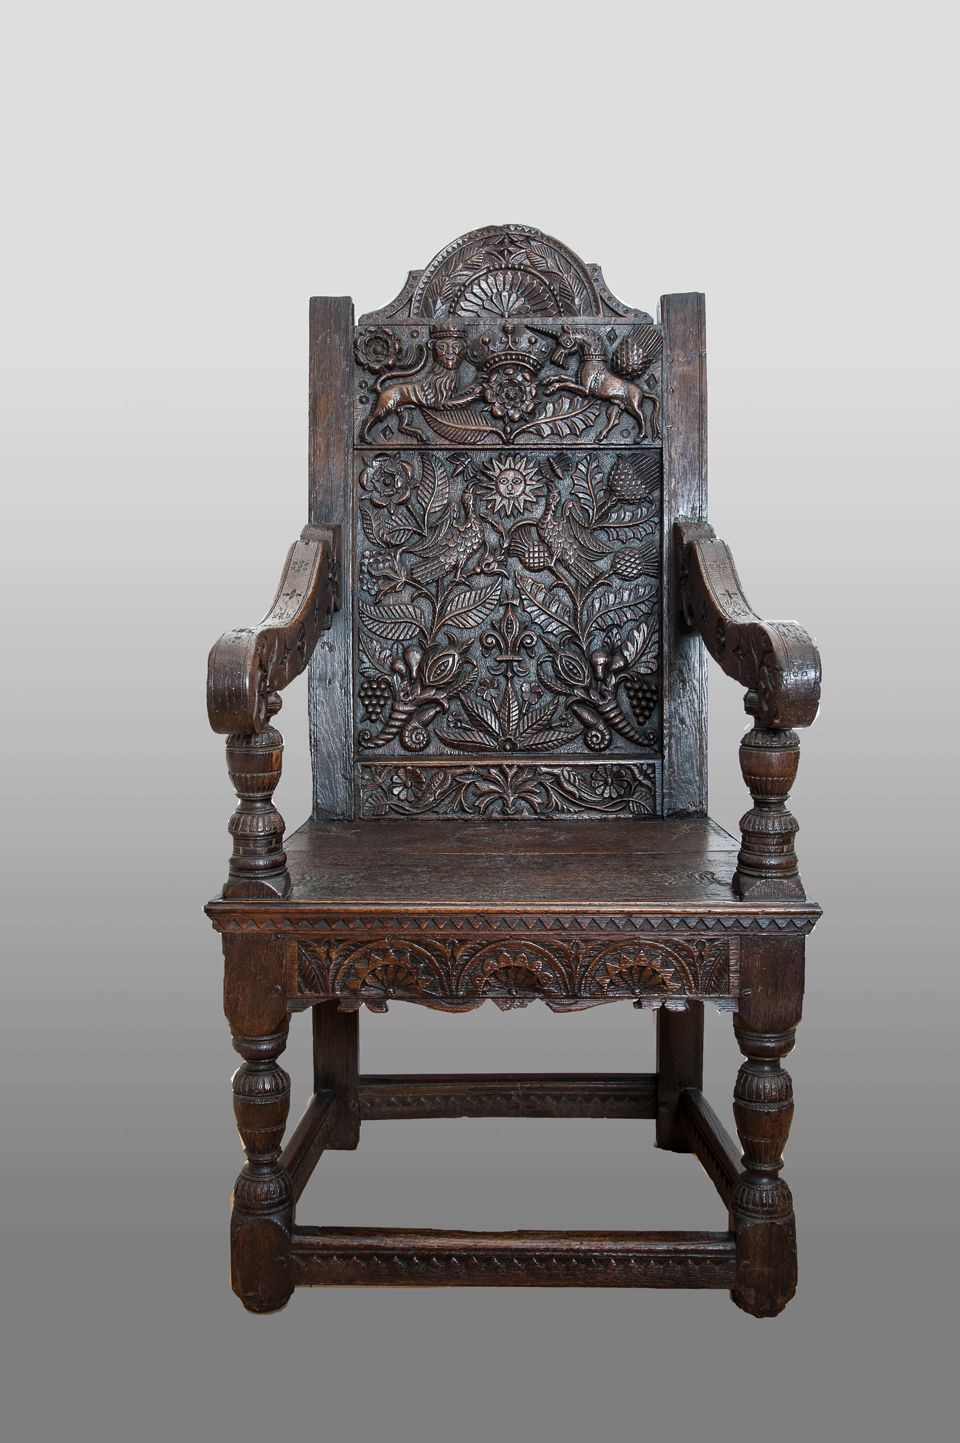 16th century armchair marhamchurch antiques seat of power pinterest eisenzeit antike. Black Bedroom Furniture Sets. Home Design Ideas